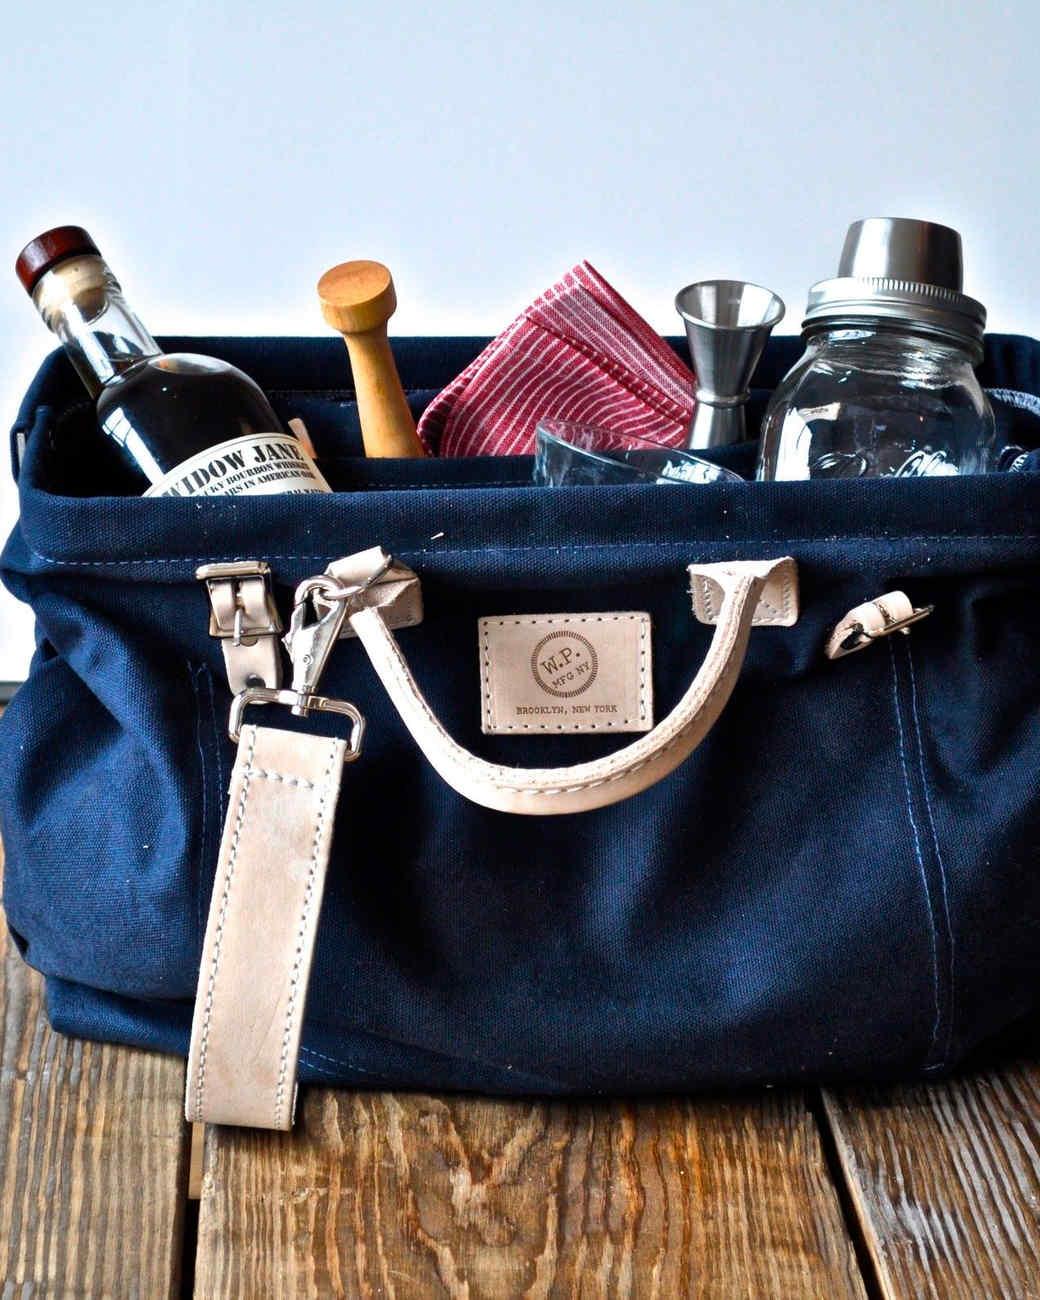 w-p-design-cocktail-carry-all-bag-05-14.jpg